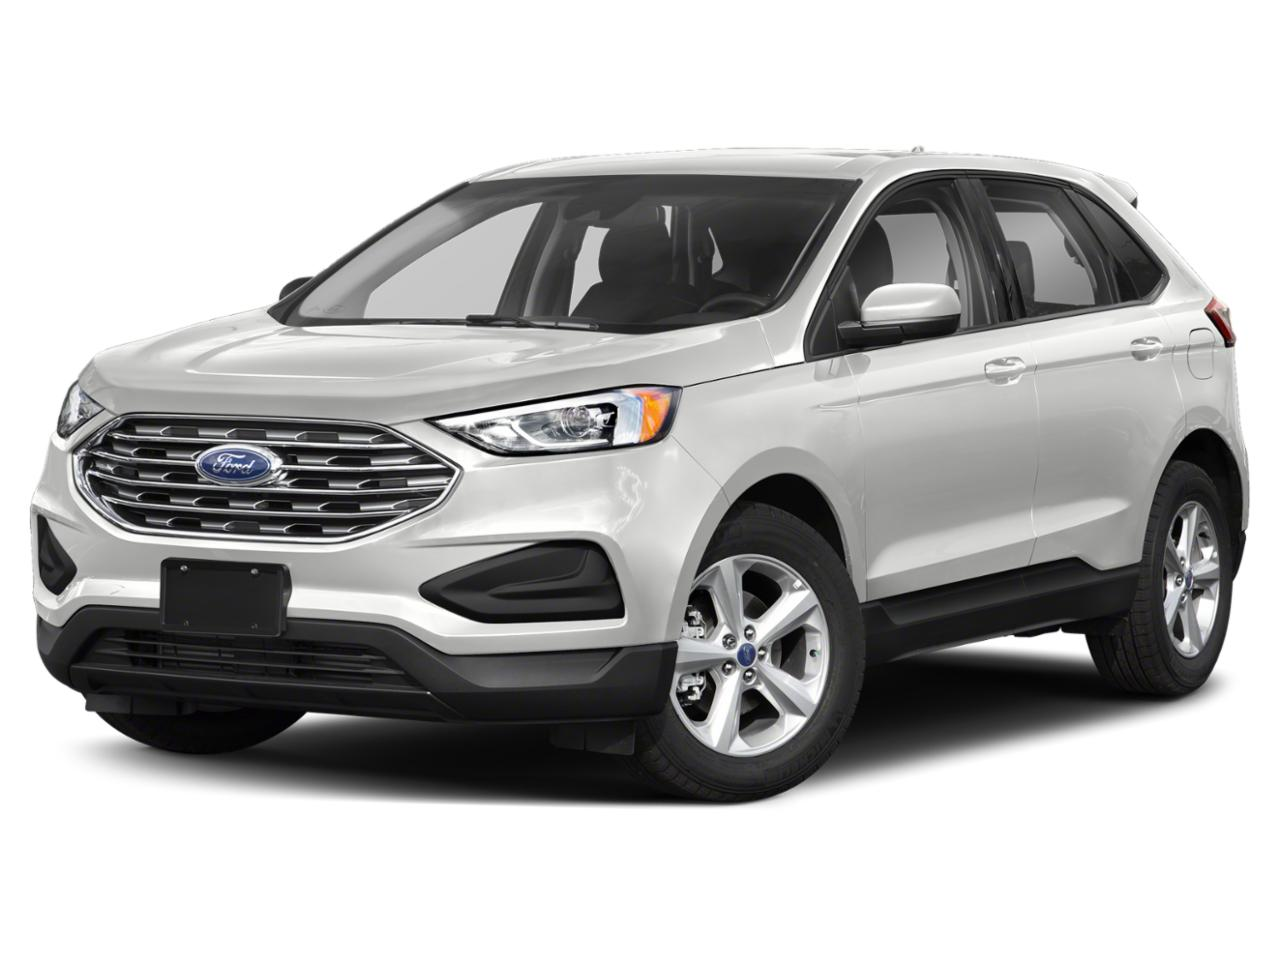 2020 Ford Edge Vehicle Photo in Neenah, WI 54956-3151